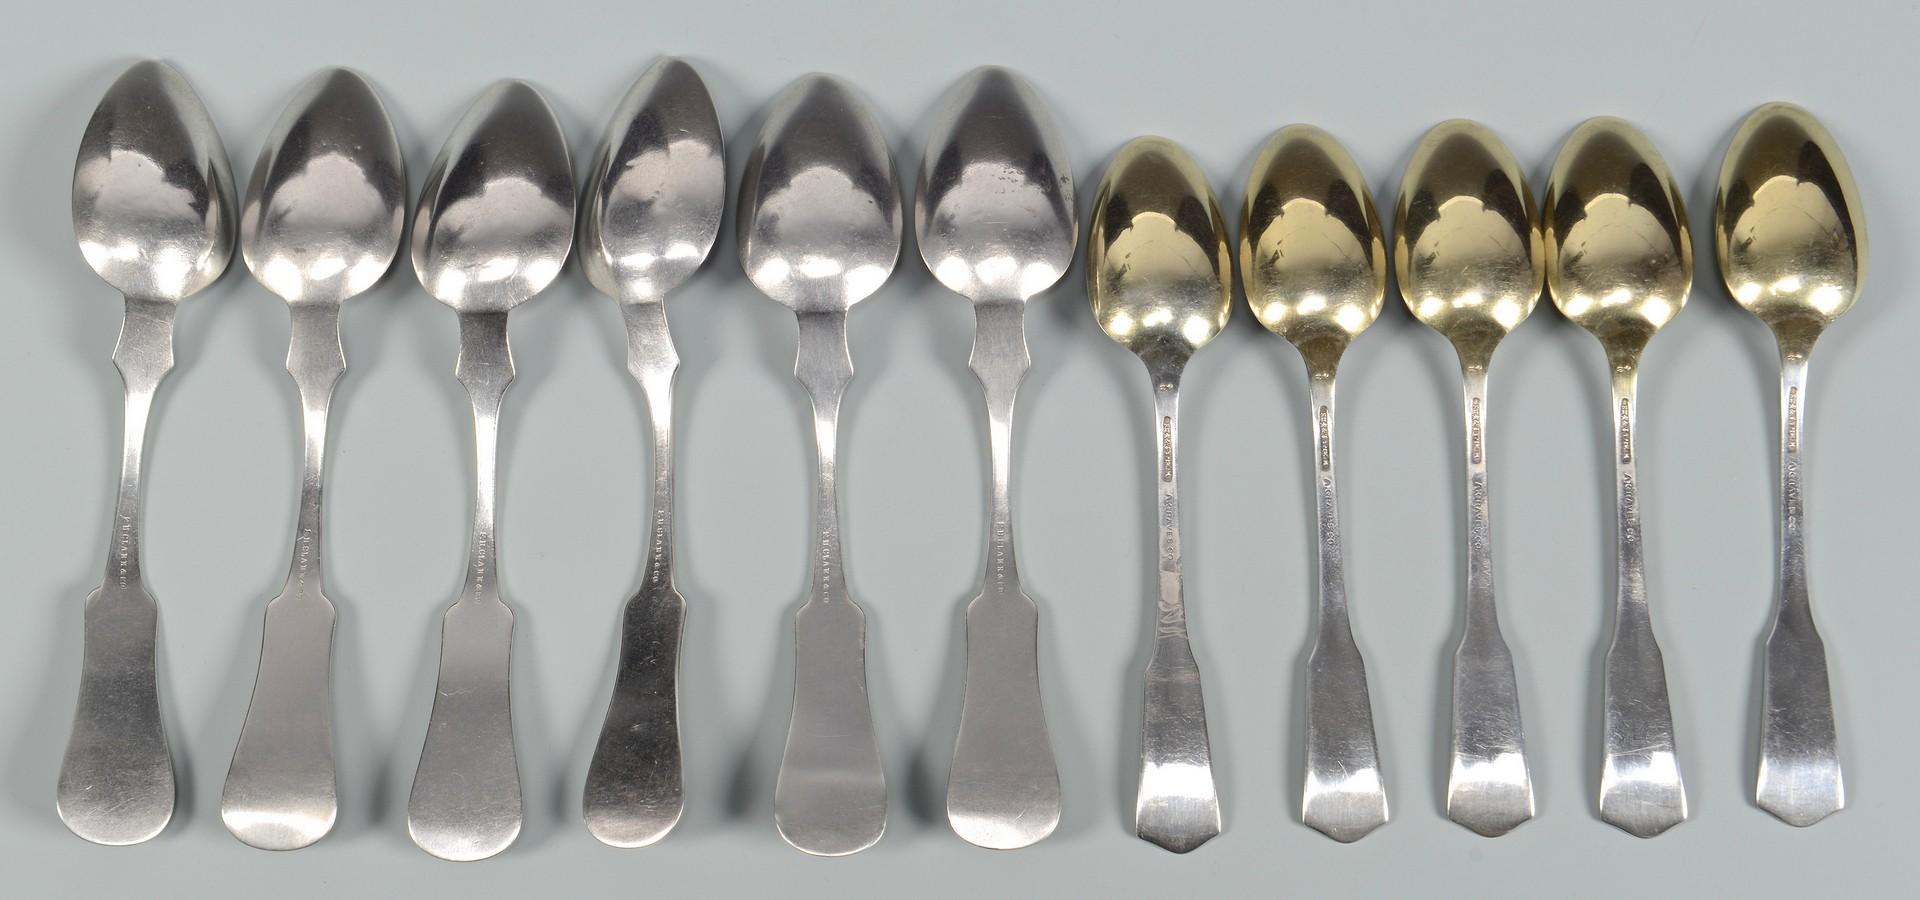 Lot 66: 11 Coin Spoons, Miss. & Tenn. interest